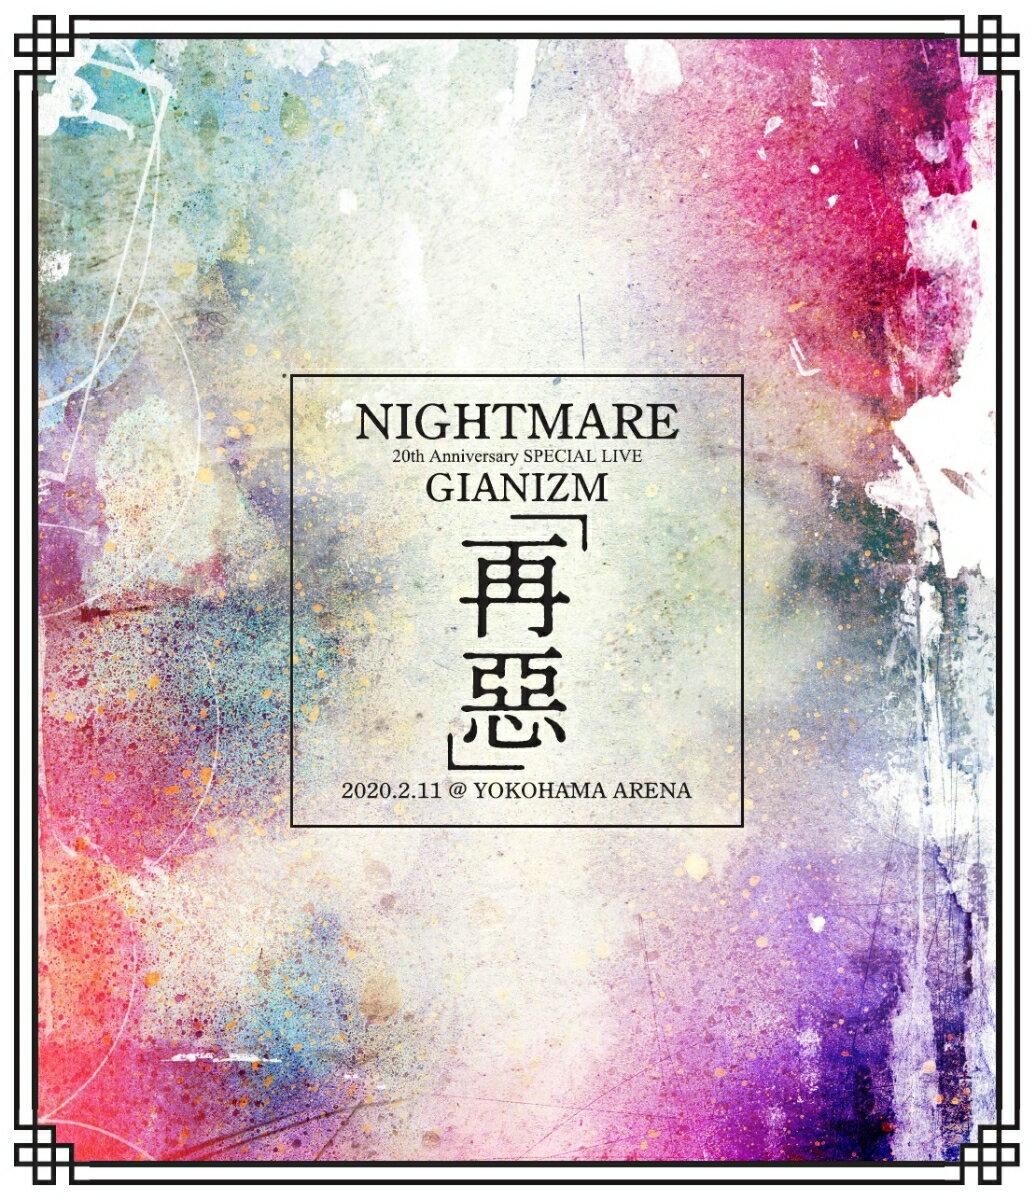 「NIGHTMARE 20th Anniversary SPECIAL LIVE GIANIZM 〜再惡〜 2020.2.11 @ YOKOHAMA ARENA」 【STANDARD EDITION:Blu-ray】【Blu-ray】画像